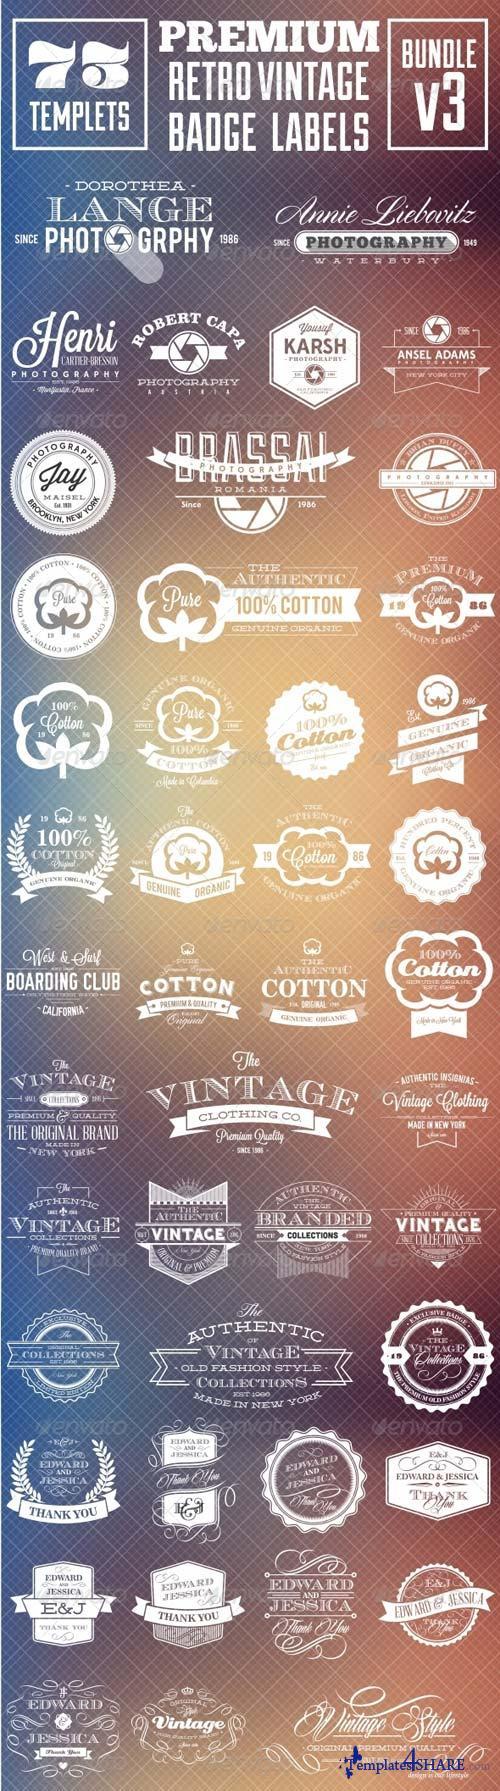 GraphicRiver Premium Retro Vintage Badge Labels Bundle v3